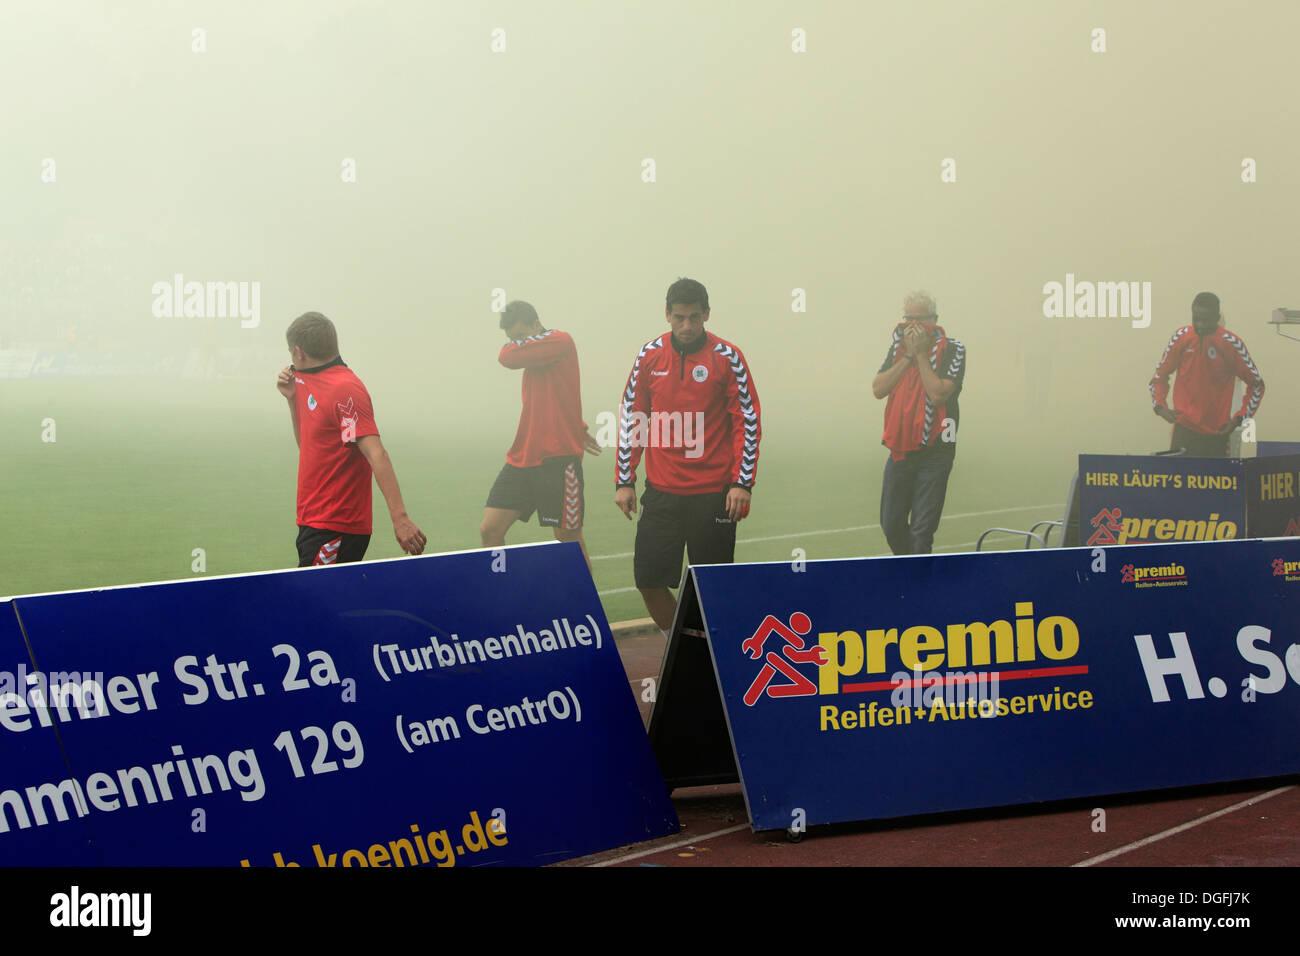 sports, football, Regional League West, 2013/2014, Rot Weiss Oberhausen versus Rot Weiss Essen 2:0, Stadium Niederrhein in Oberhausen, football fans of RW Essen firing smoke-bombs, fume, haze, mist, players and guardians with gum shields, danger to health - Stock Image